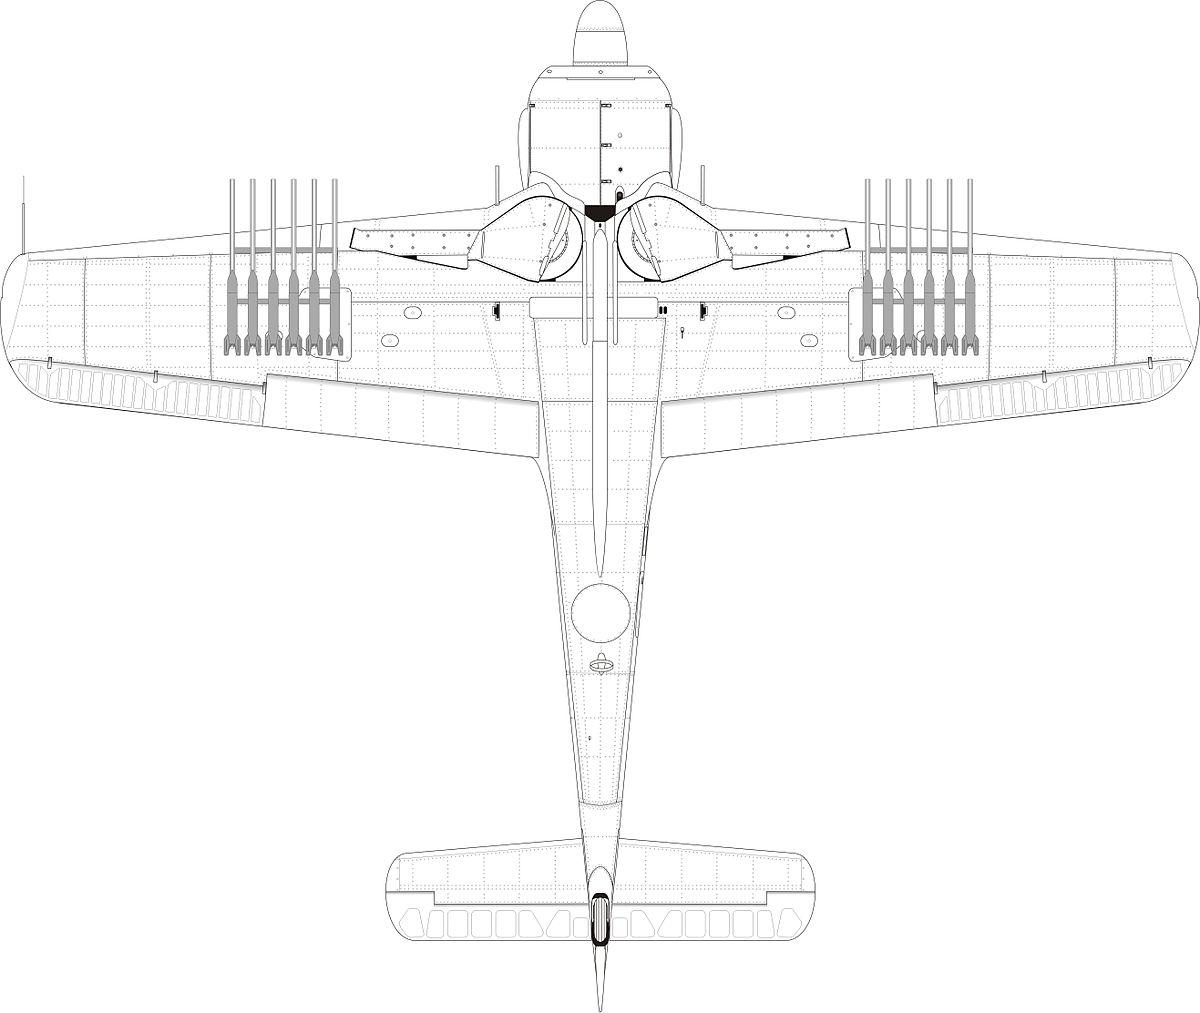 Germanluftwaffe archiv dokumente abc